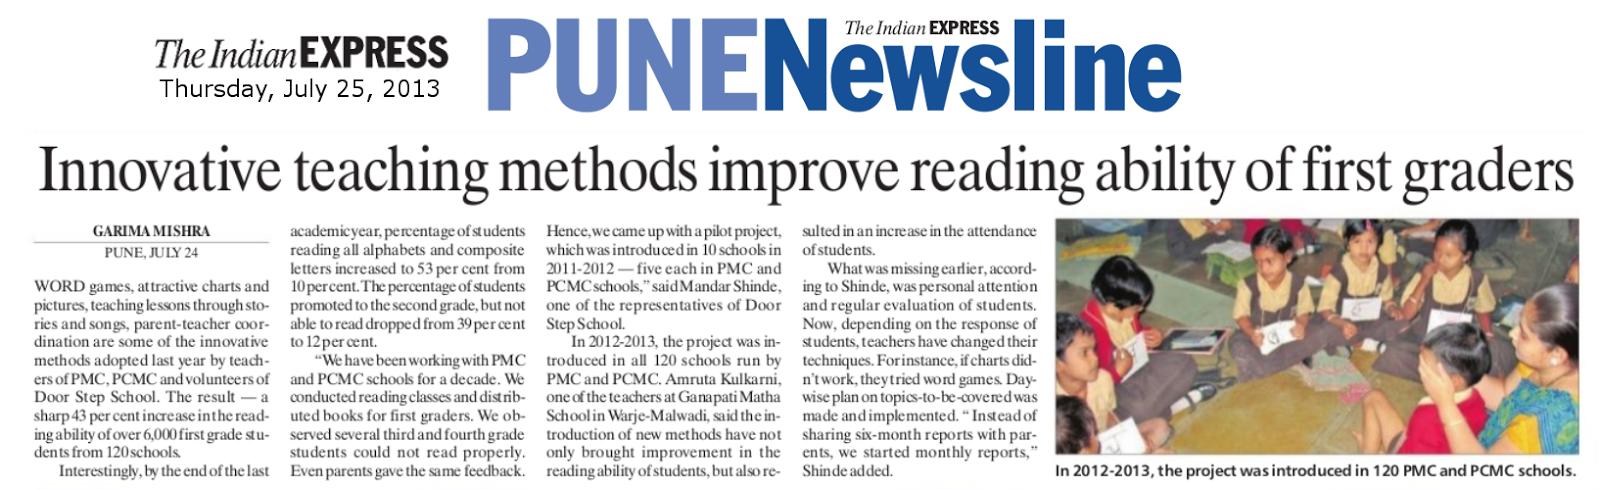 Door Step School, Pune : Innovative teaching methods improve